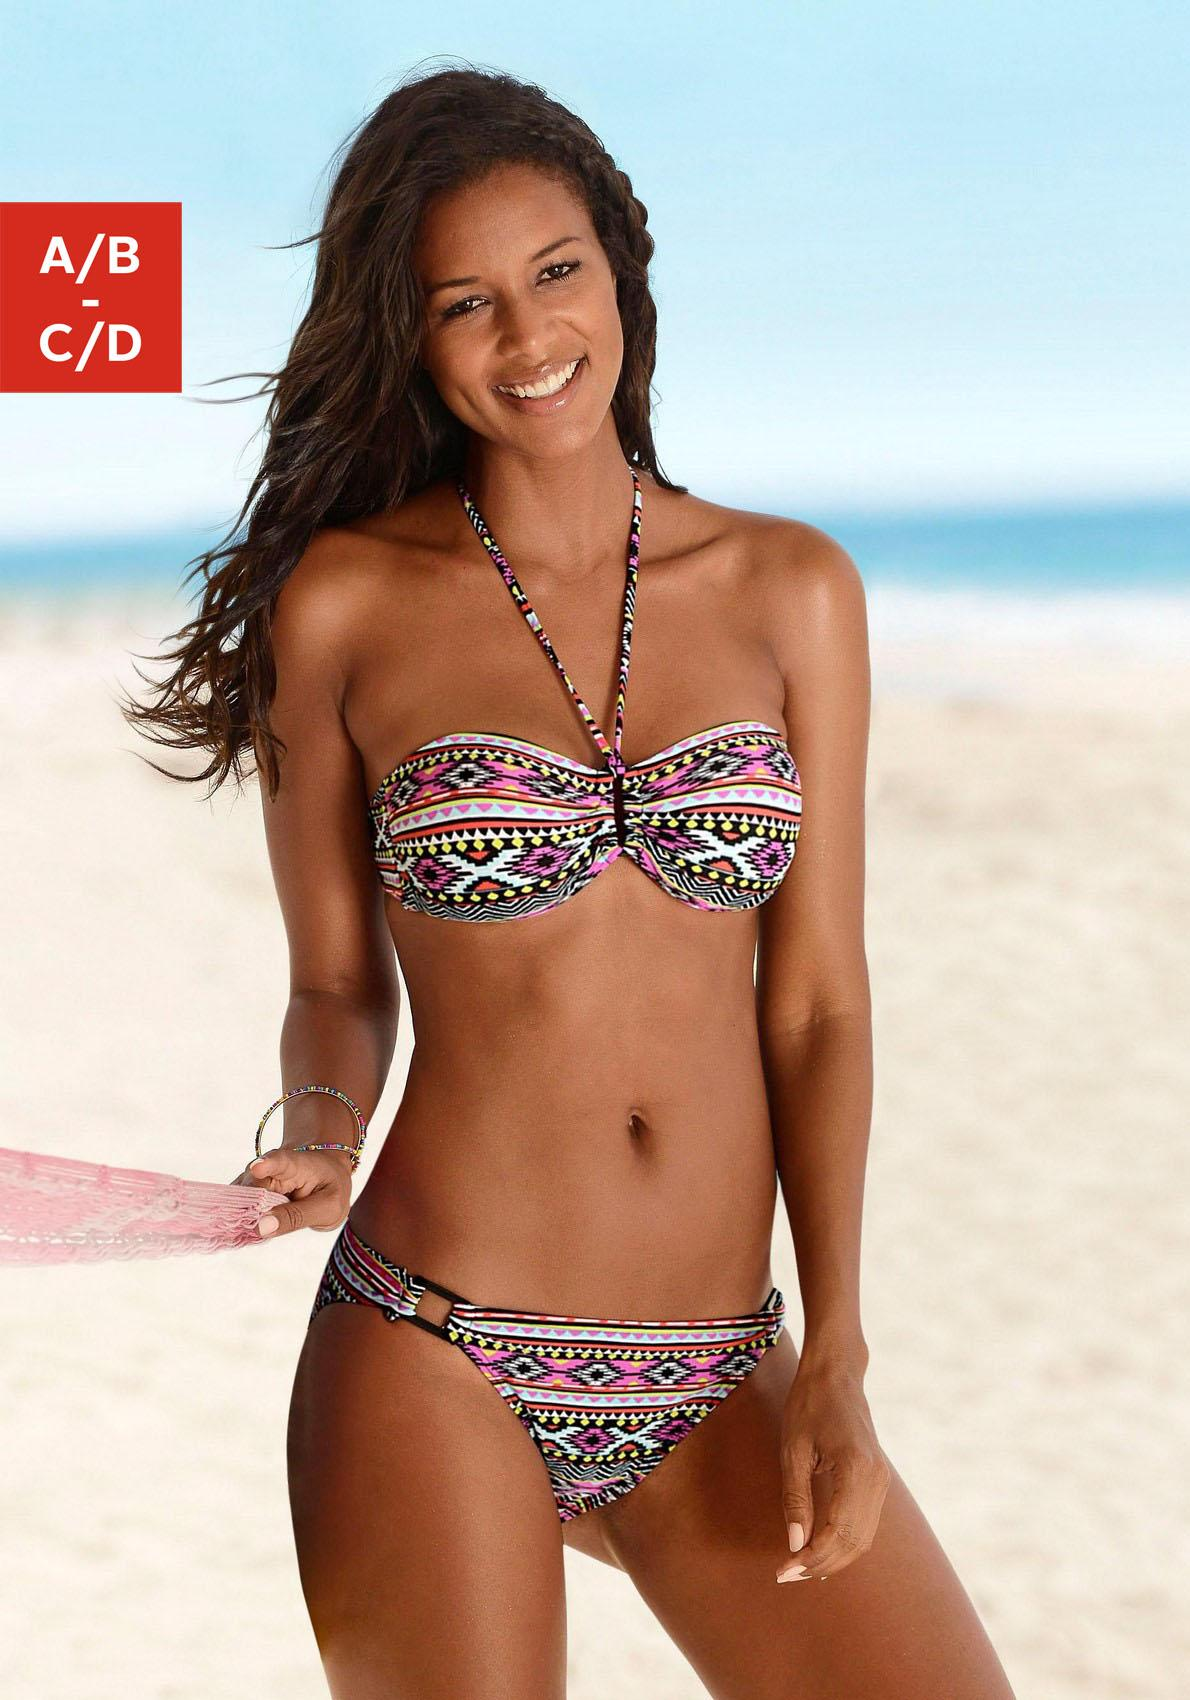 LASCANA Bandeau-Bikini im trendigen Ethno-Print